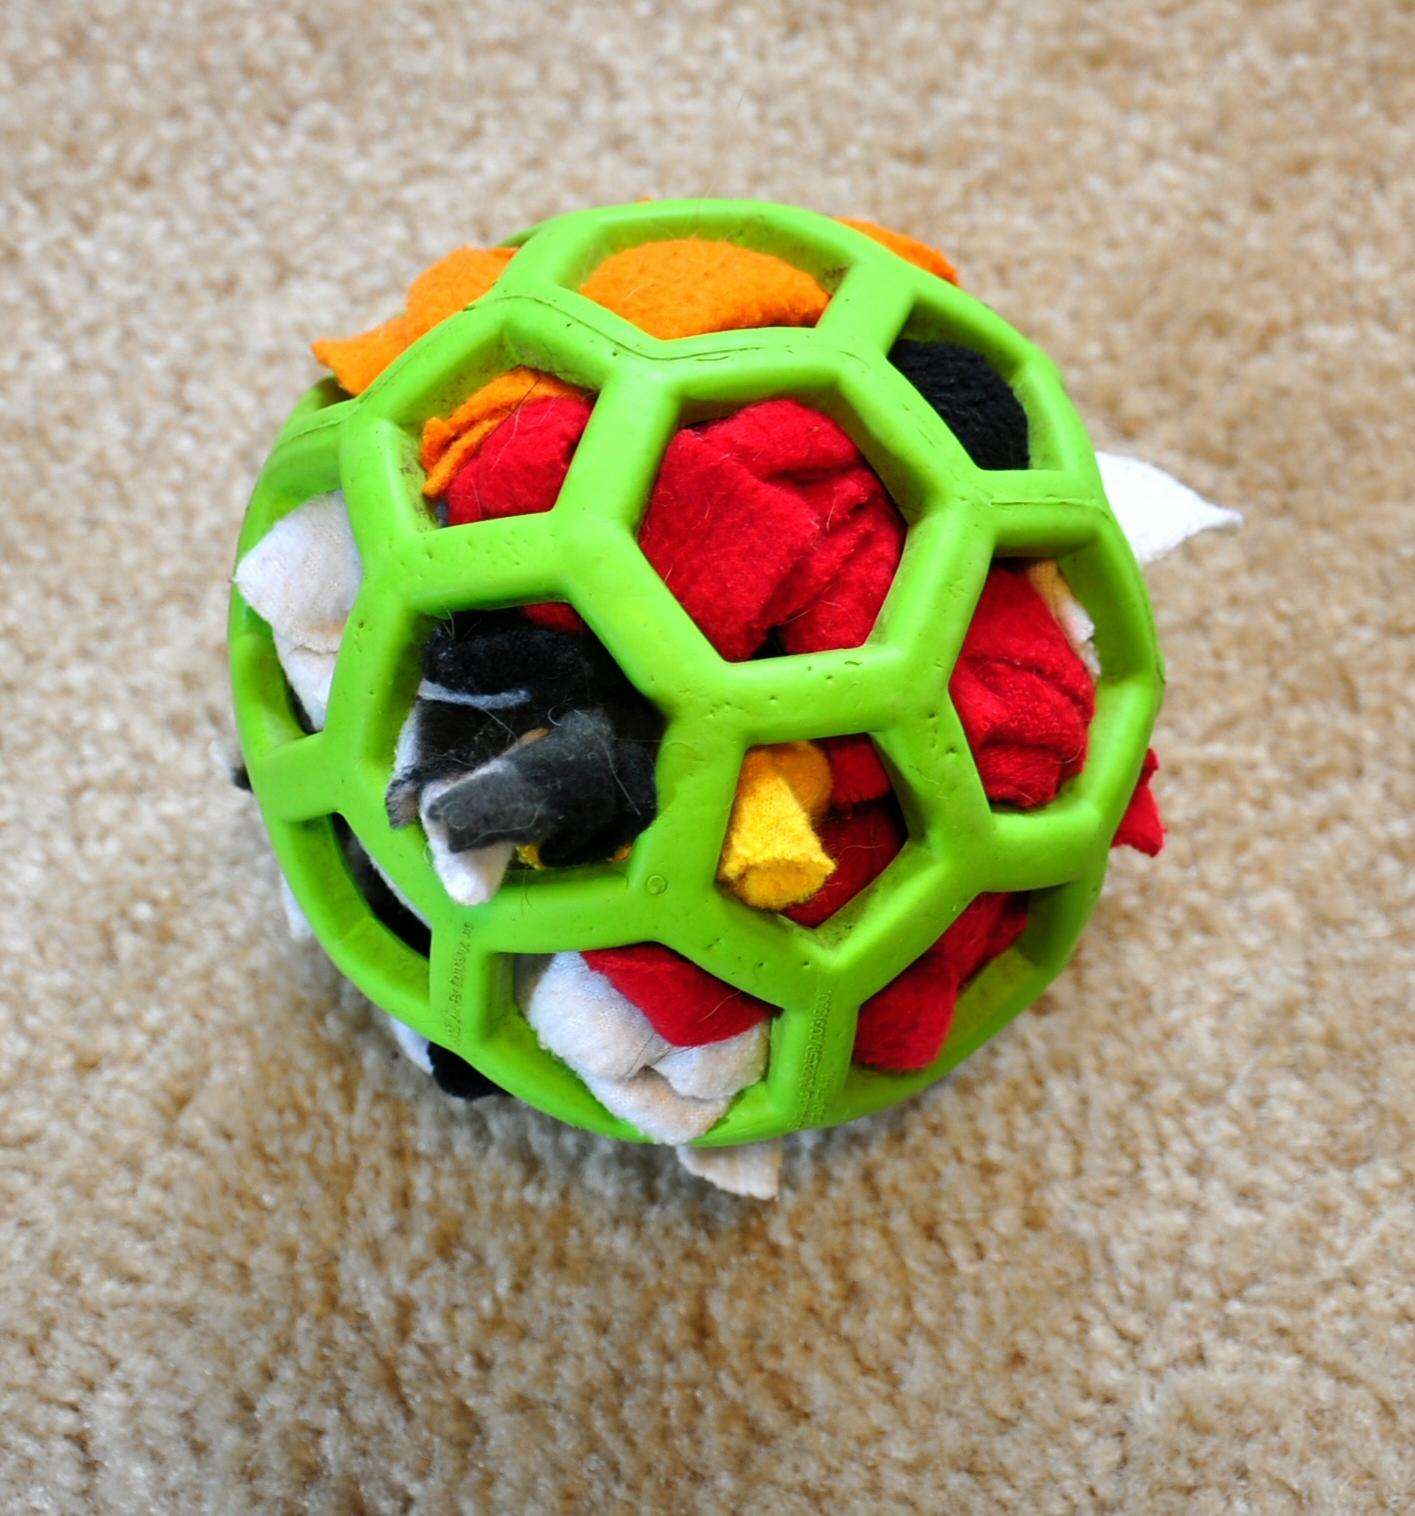 Semi-destructible stuffed toy